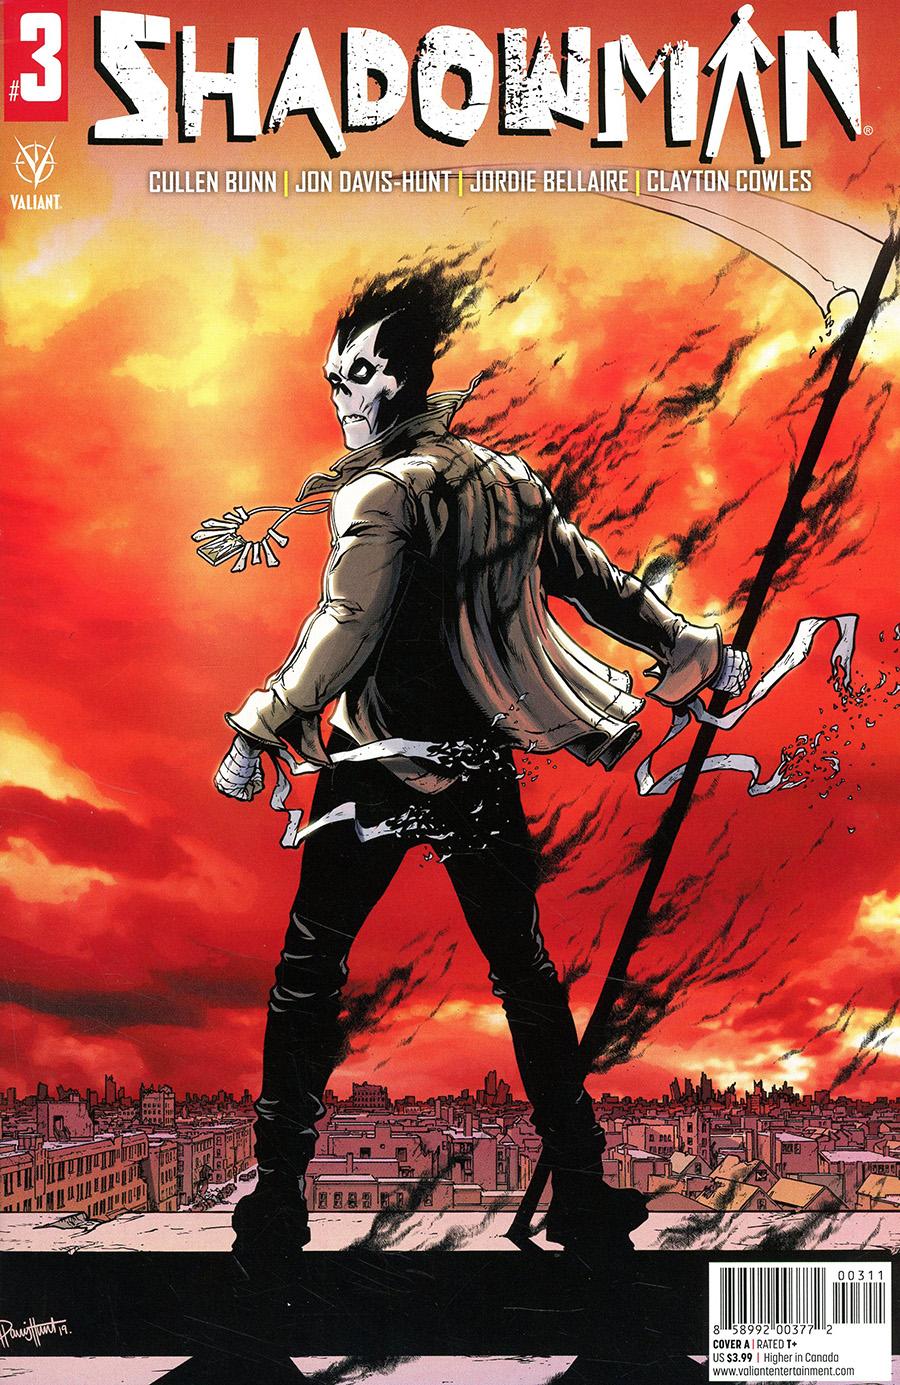 Shadowman Vol 6 #3 Cover A Regular Jon Davis-Hunt Cover